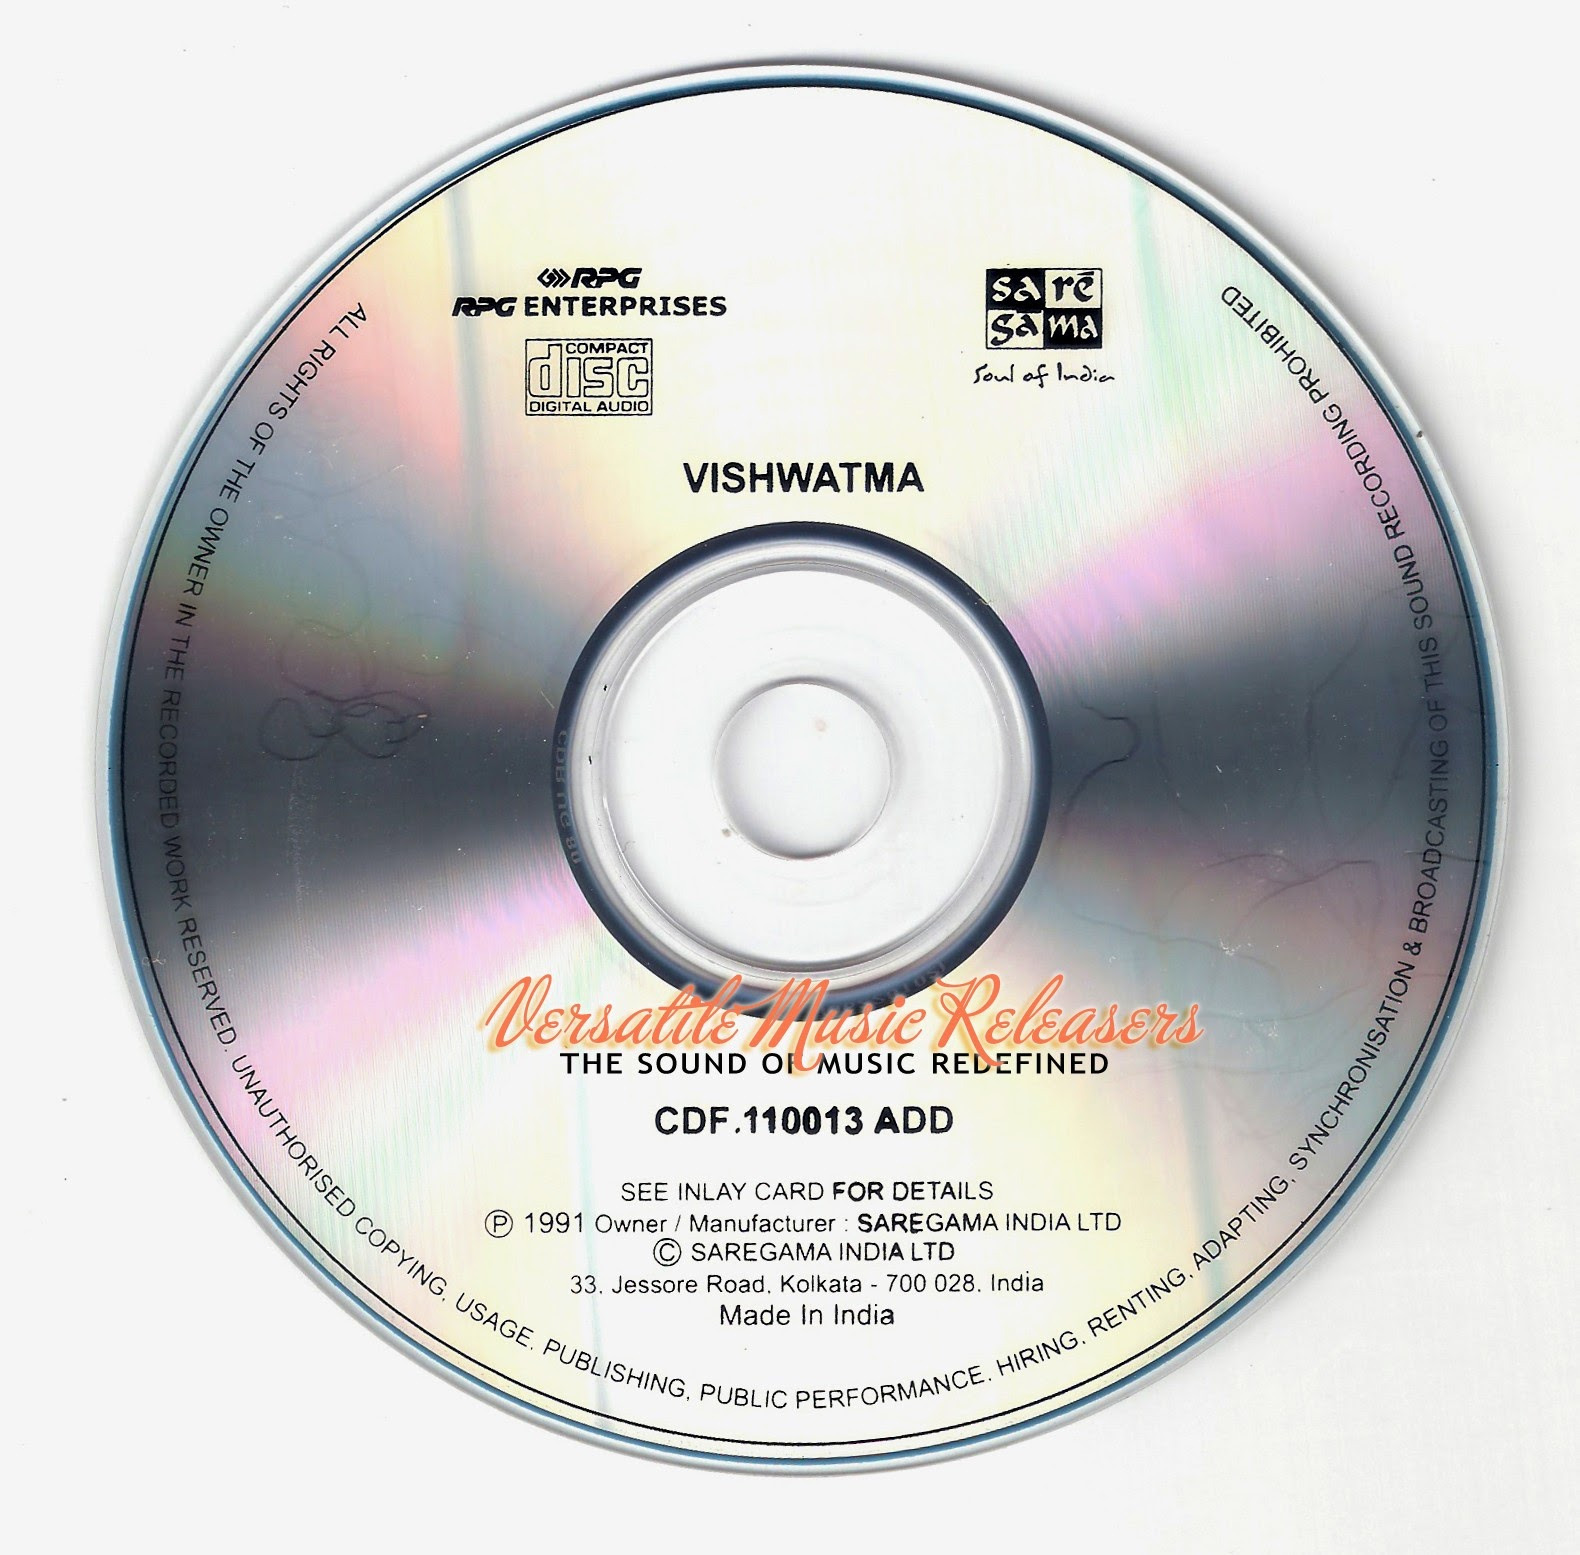 Saat Samundar Paar Baaghi 2 Song Download: ALL SONGS FREE DOWNLOAD AND LISTEN ONLINE: Vishwatma (1992